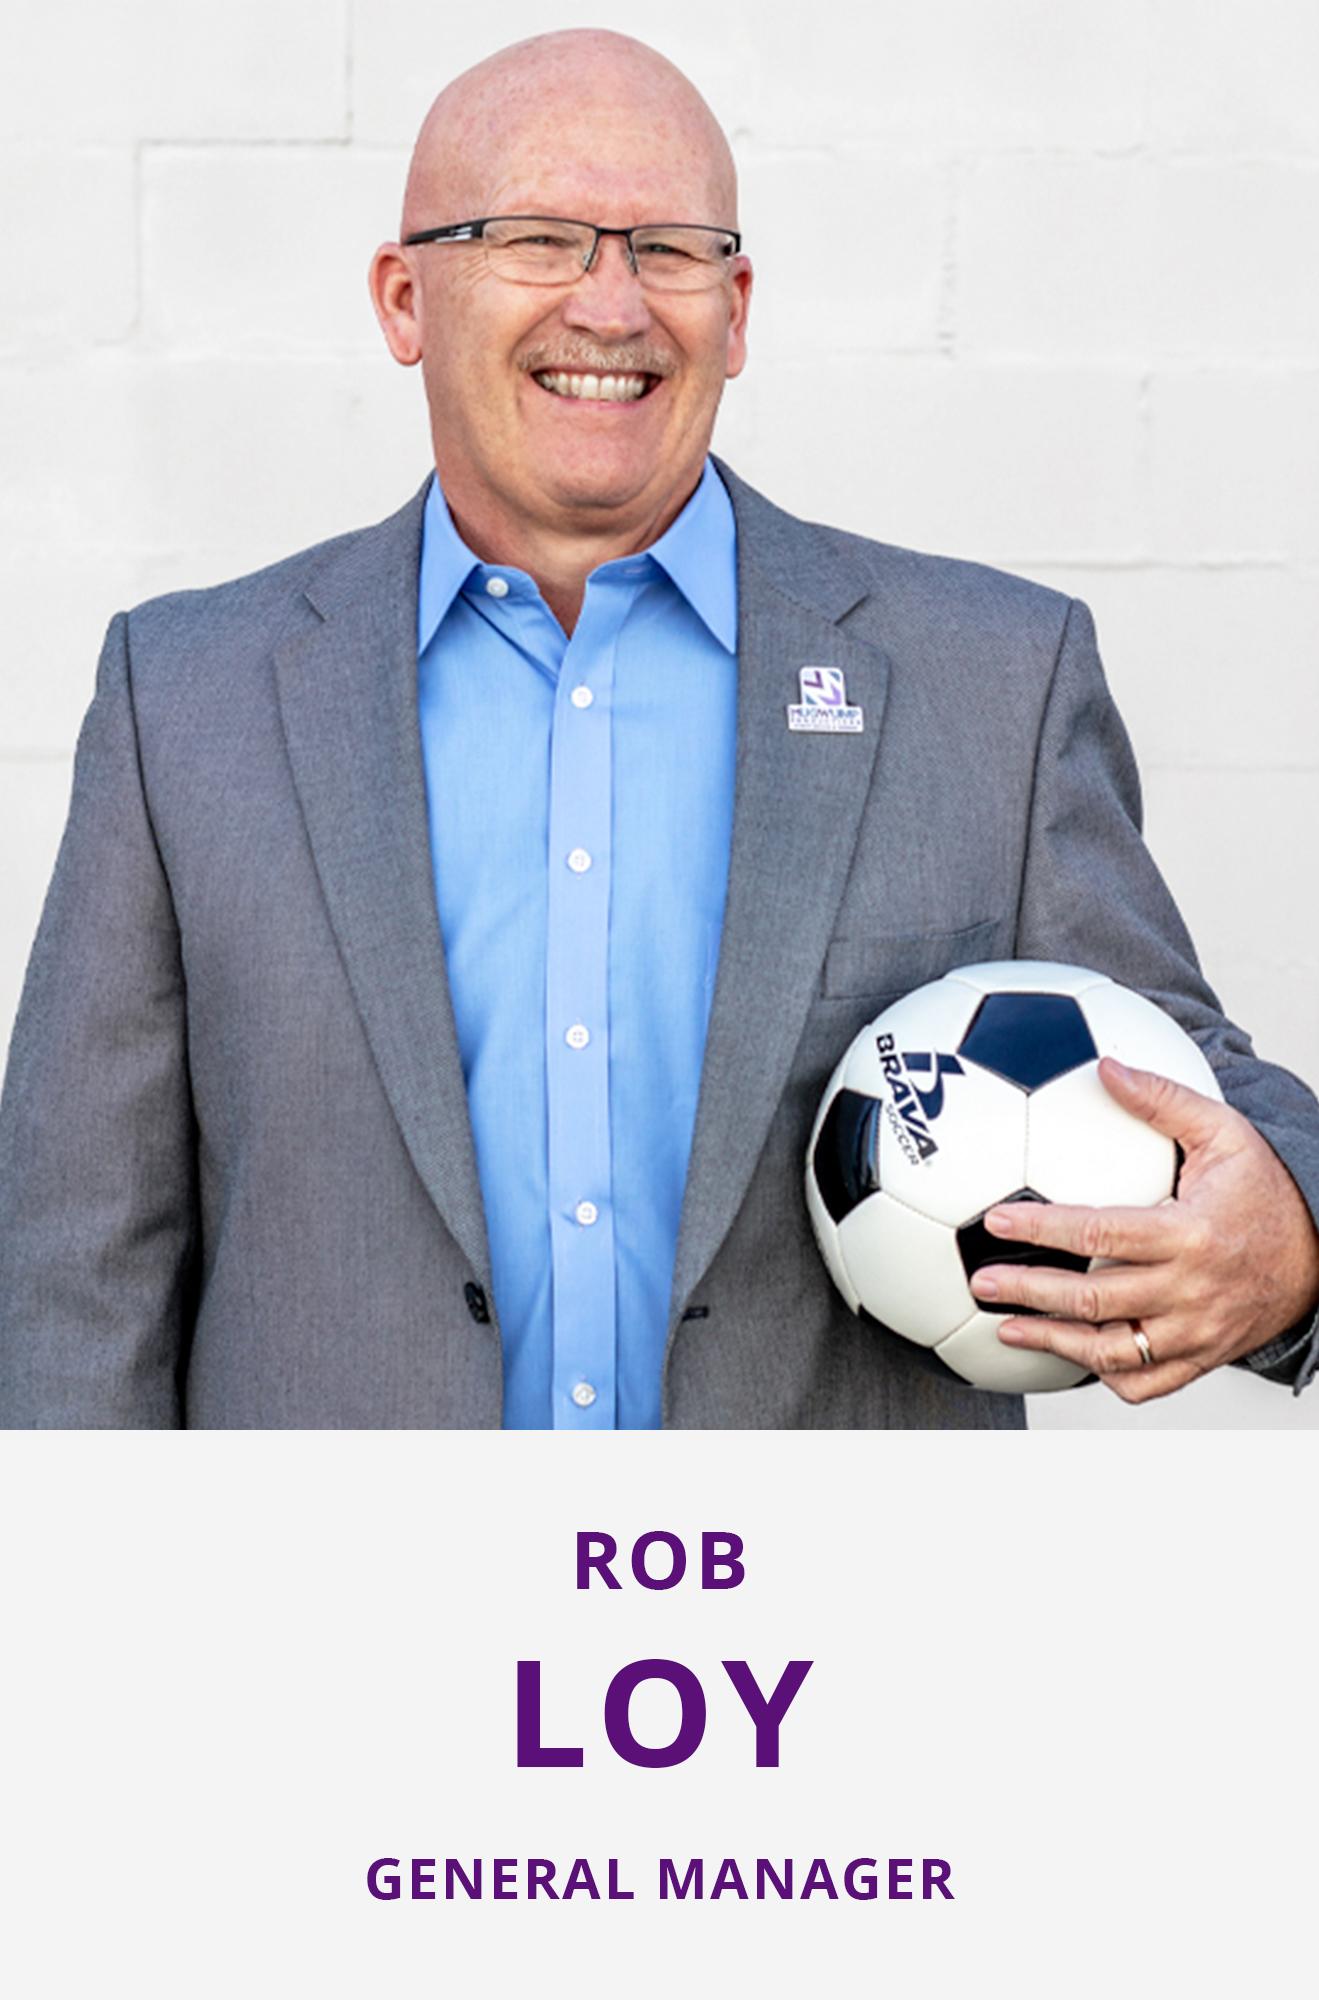 Rob Loy